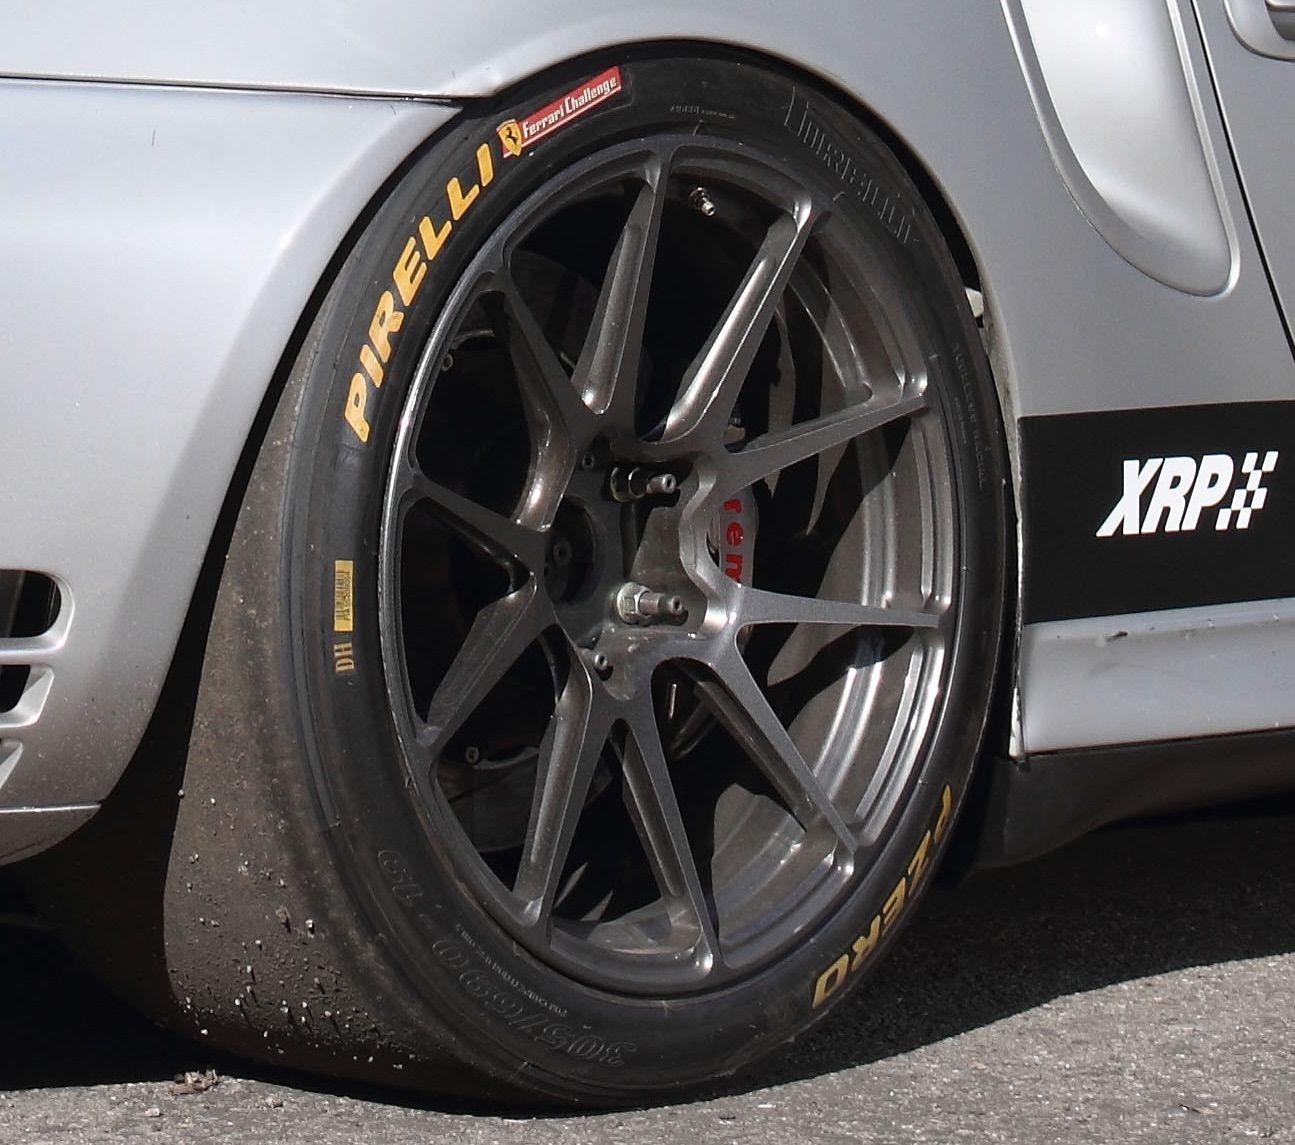 2001 Porsche 911 | Projekt King Kong on GA1R Open Lug Wheels